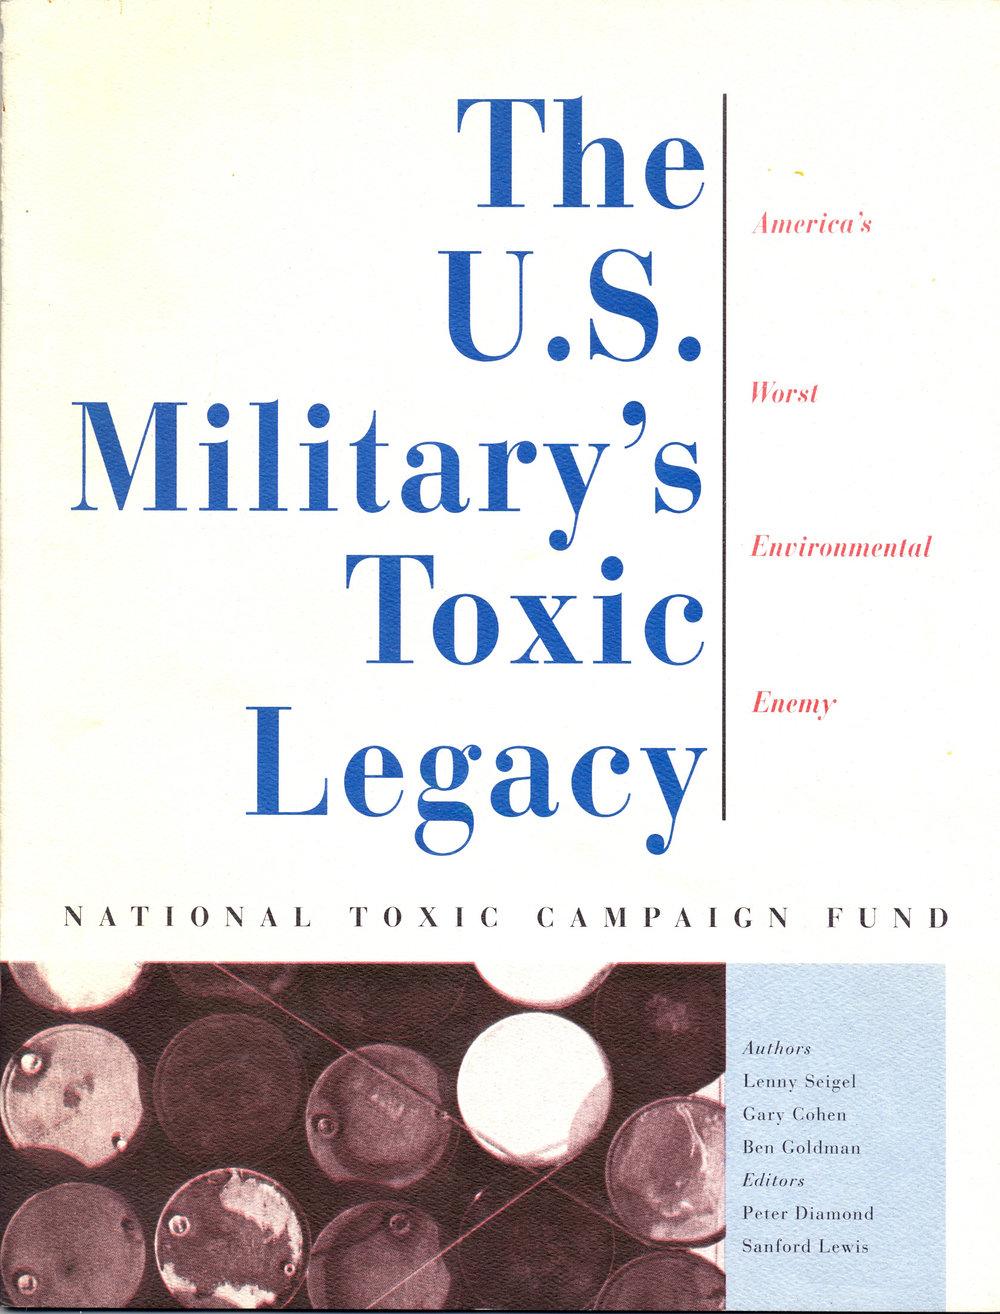 US Military toxics legacy.jpg